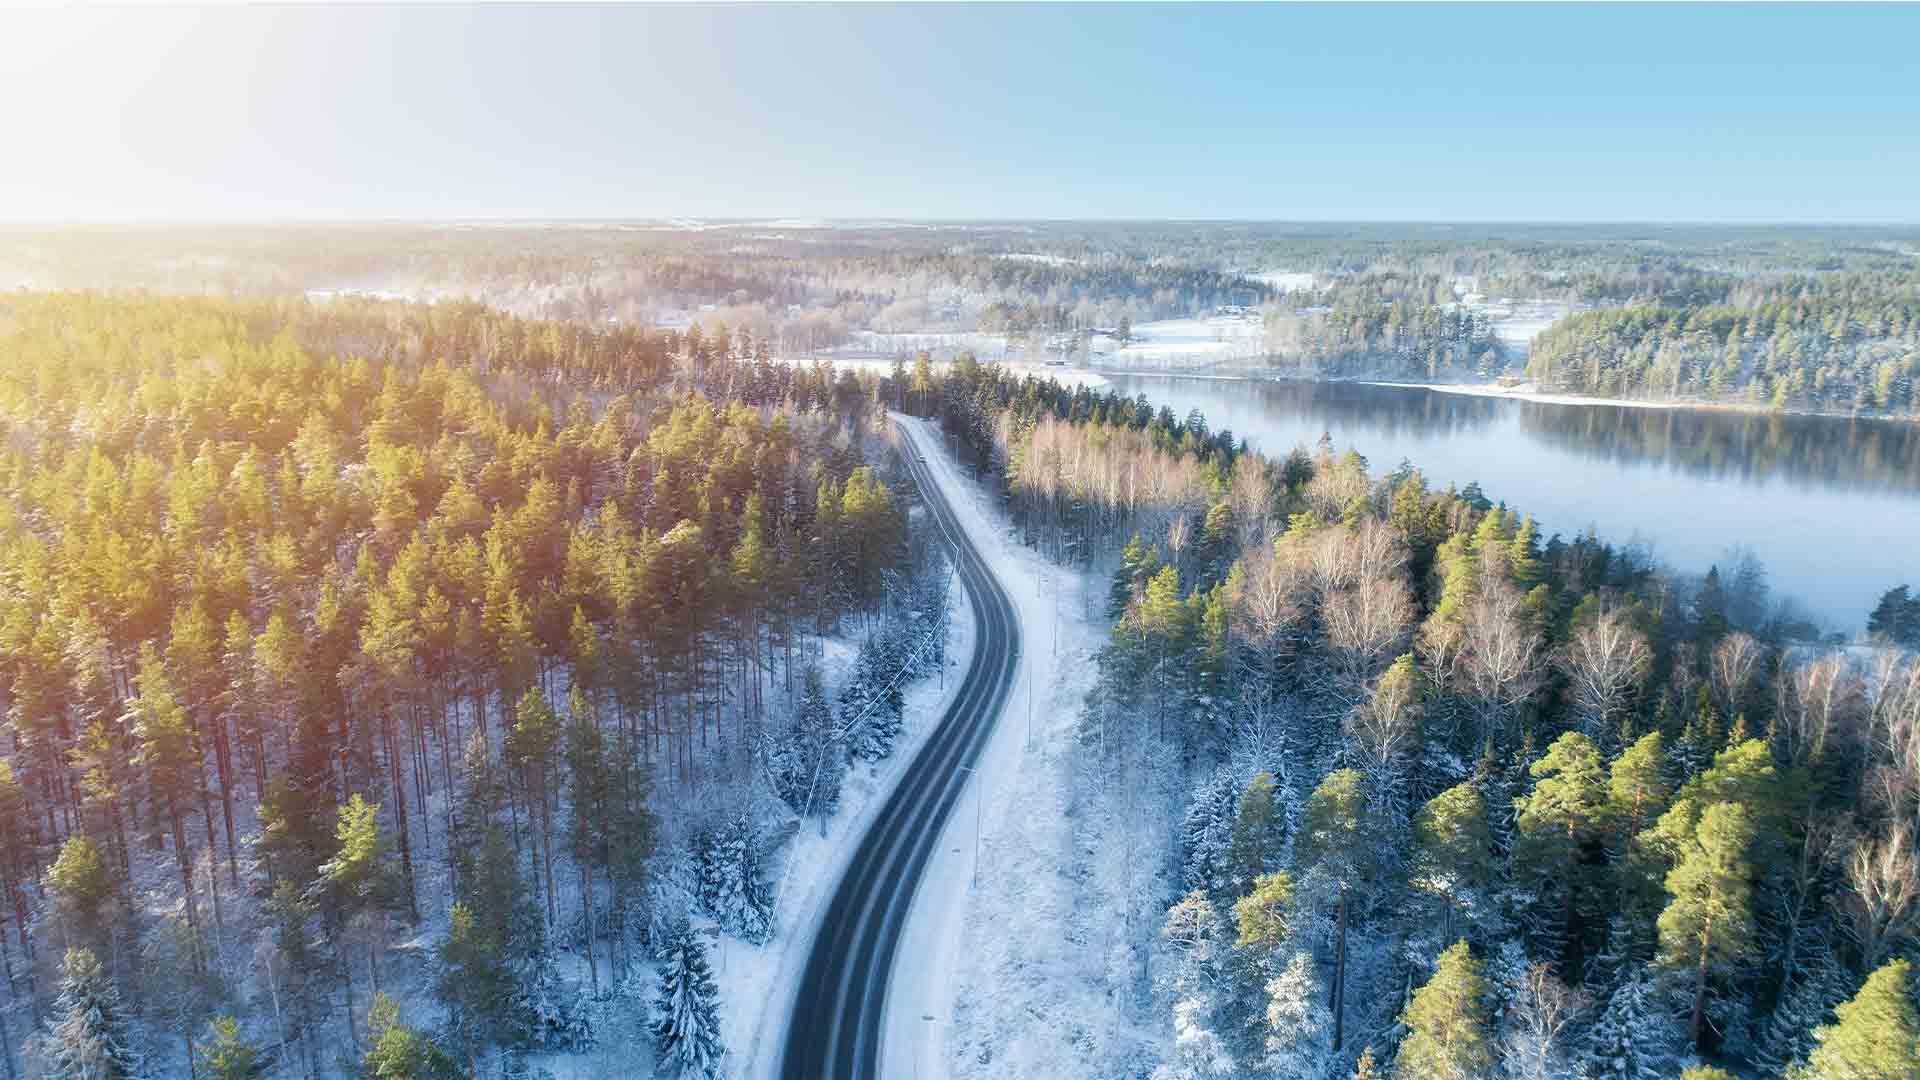 Autoreizen tussen Noorwegen, Zweden en Finland.jpeg